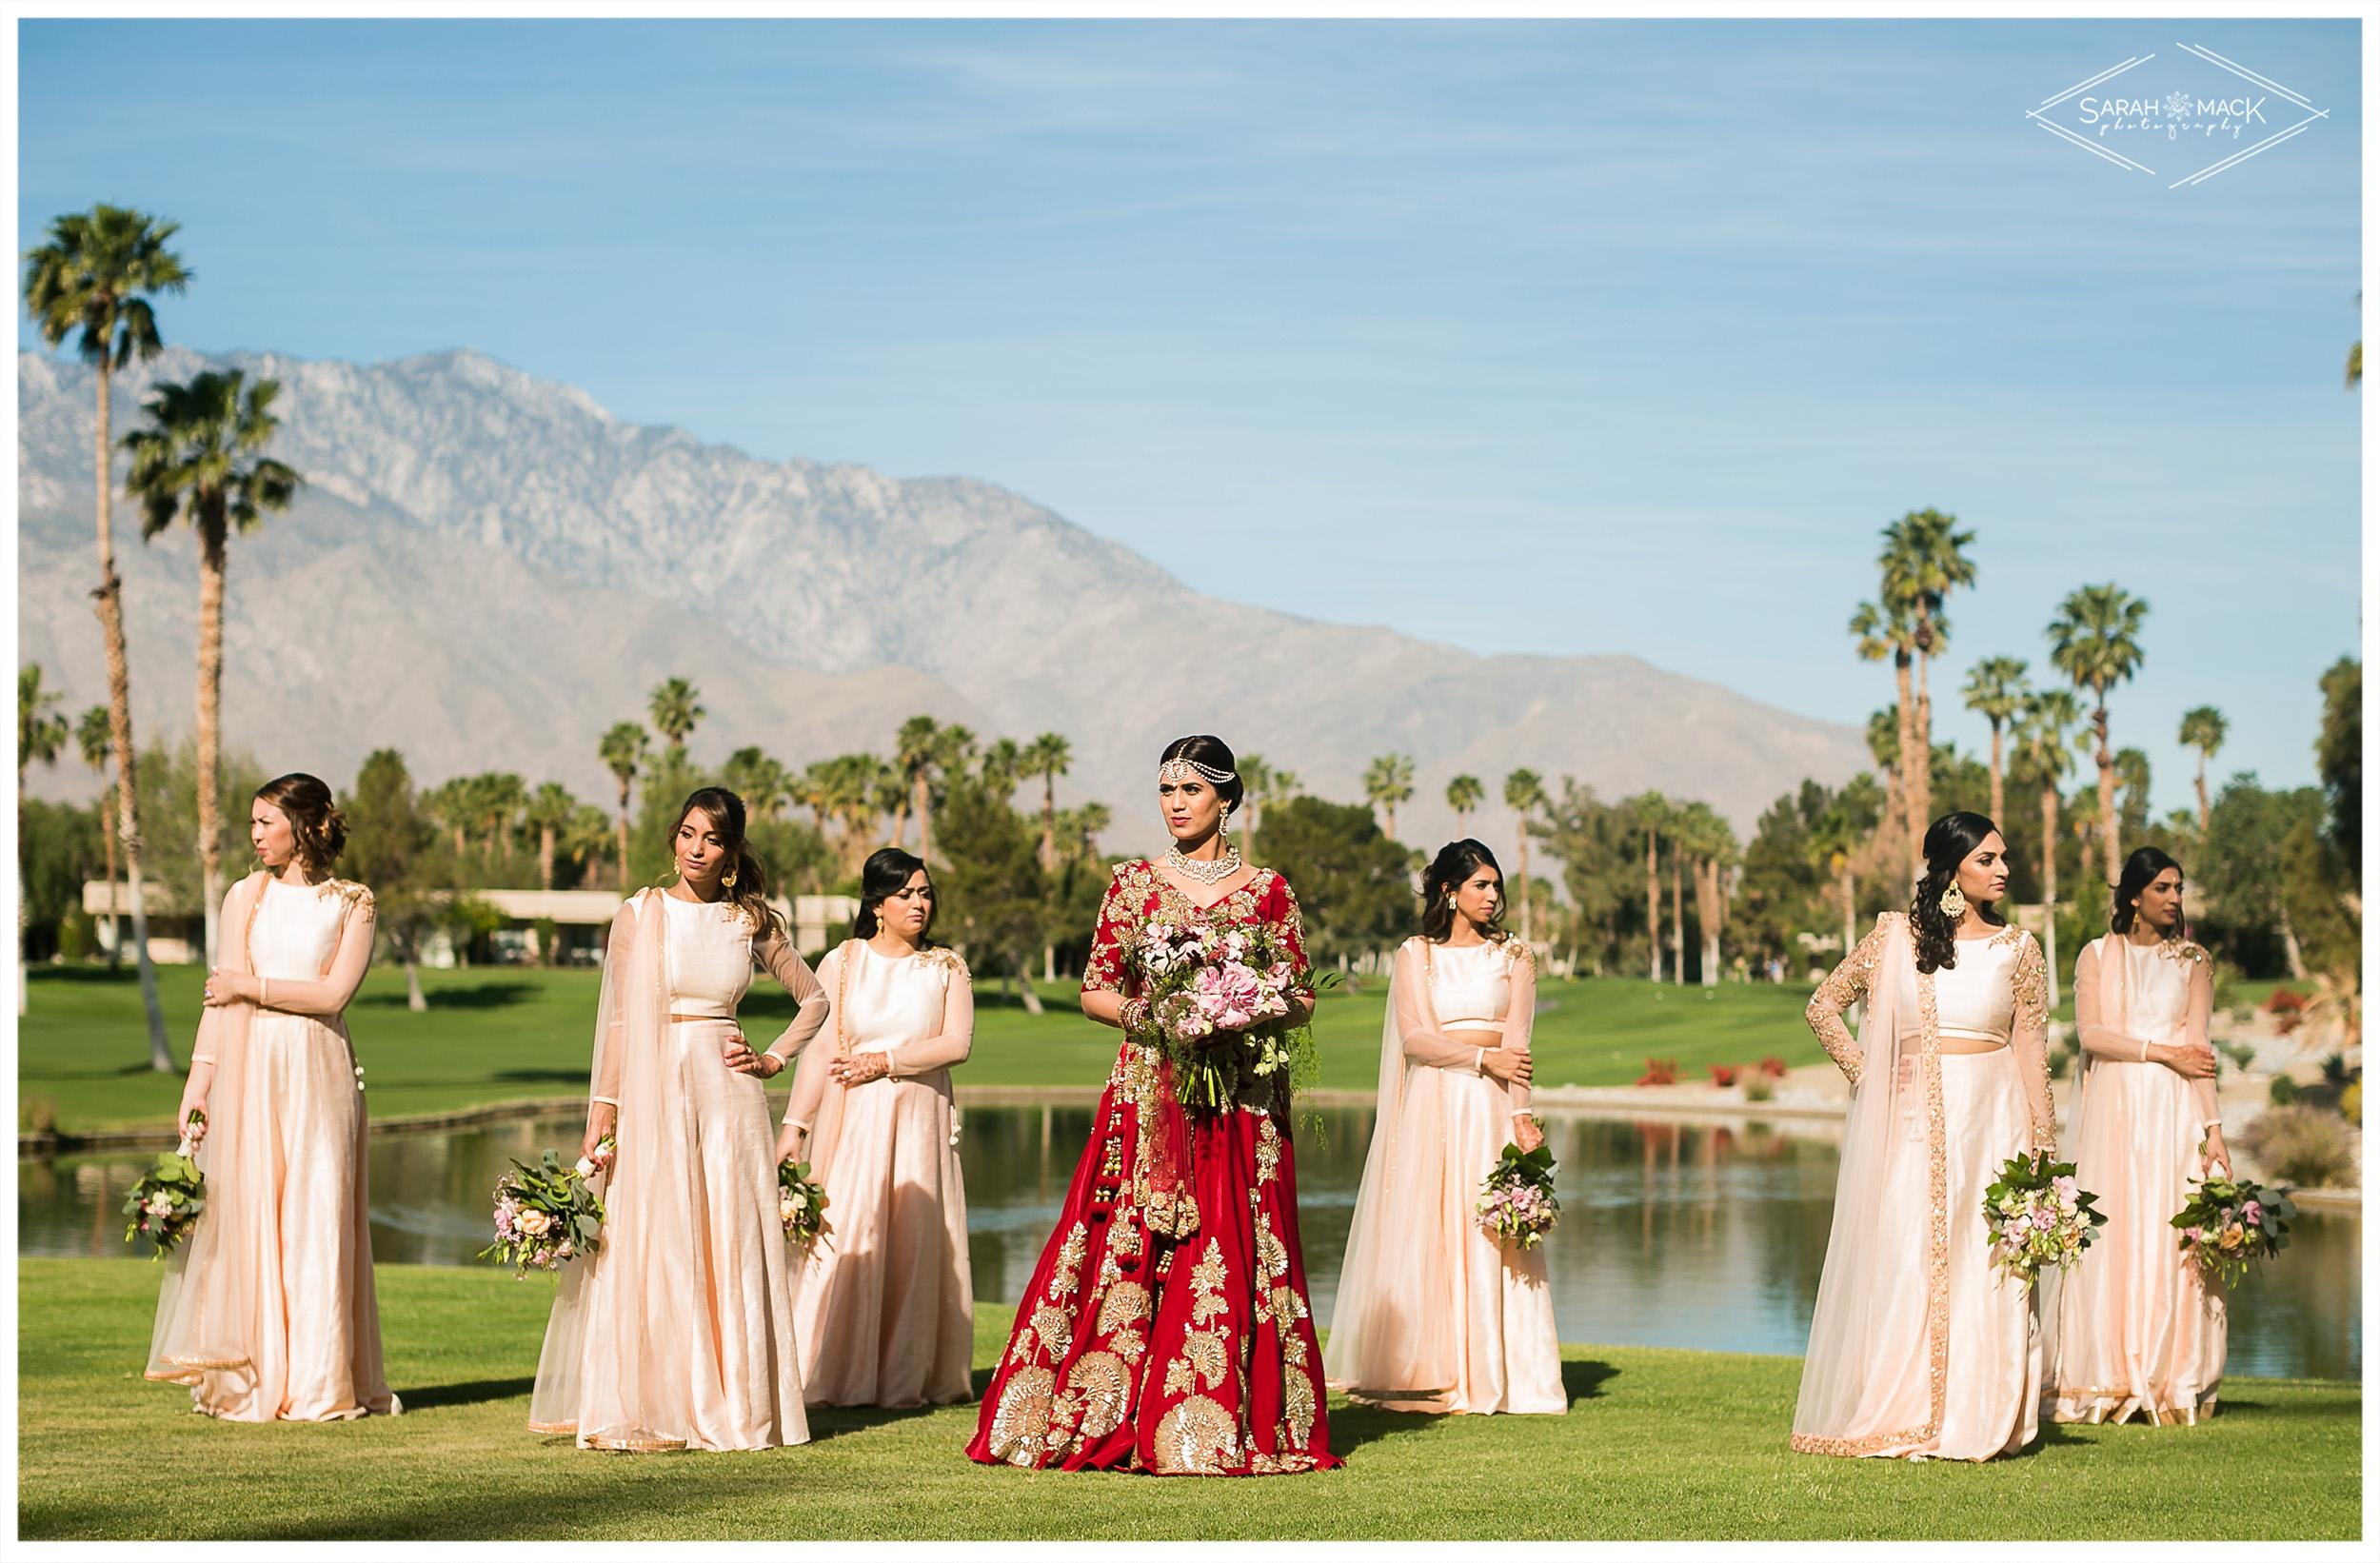 PR-Double-Tree-Hilton-Palm-Springs-Indian-Wedding-47.jpg